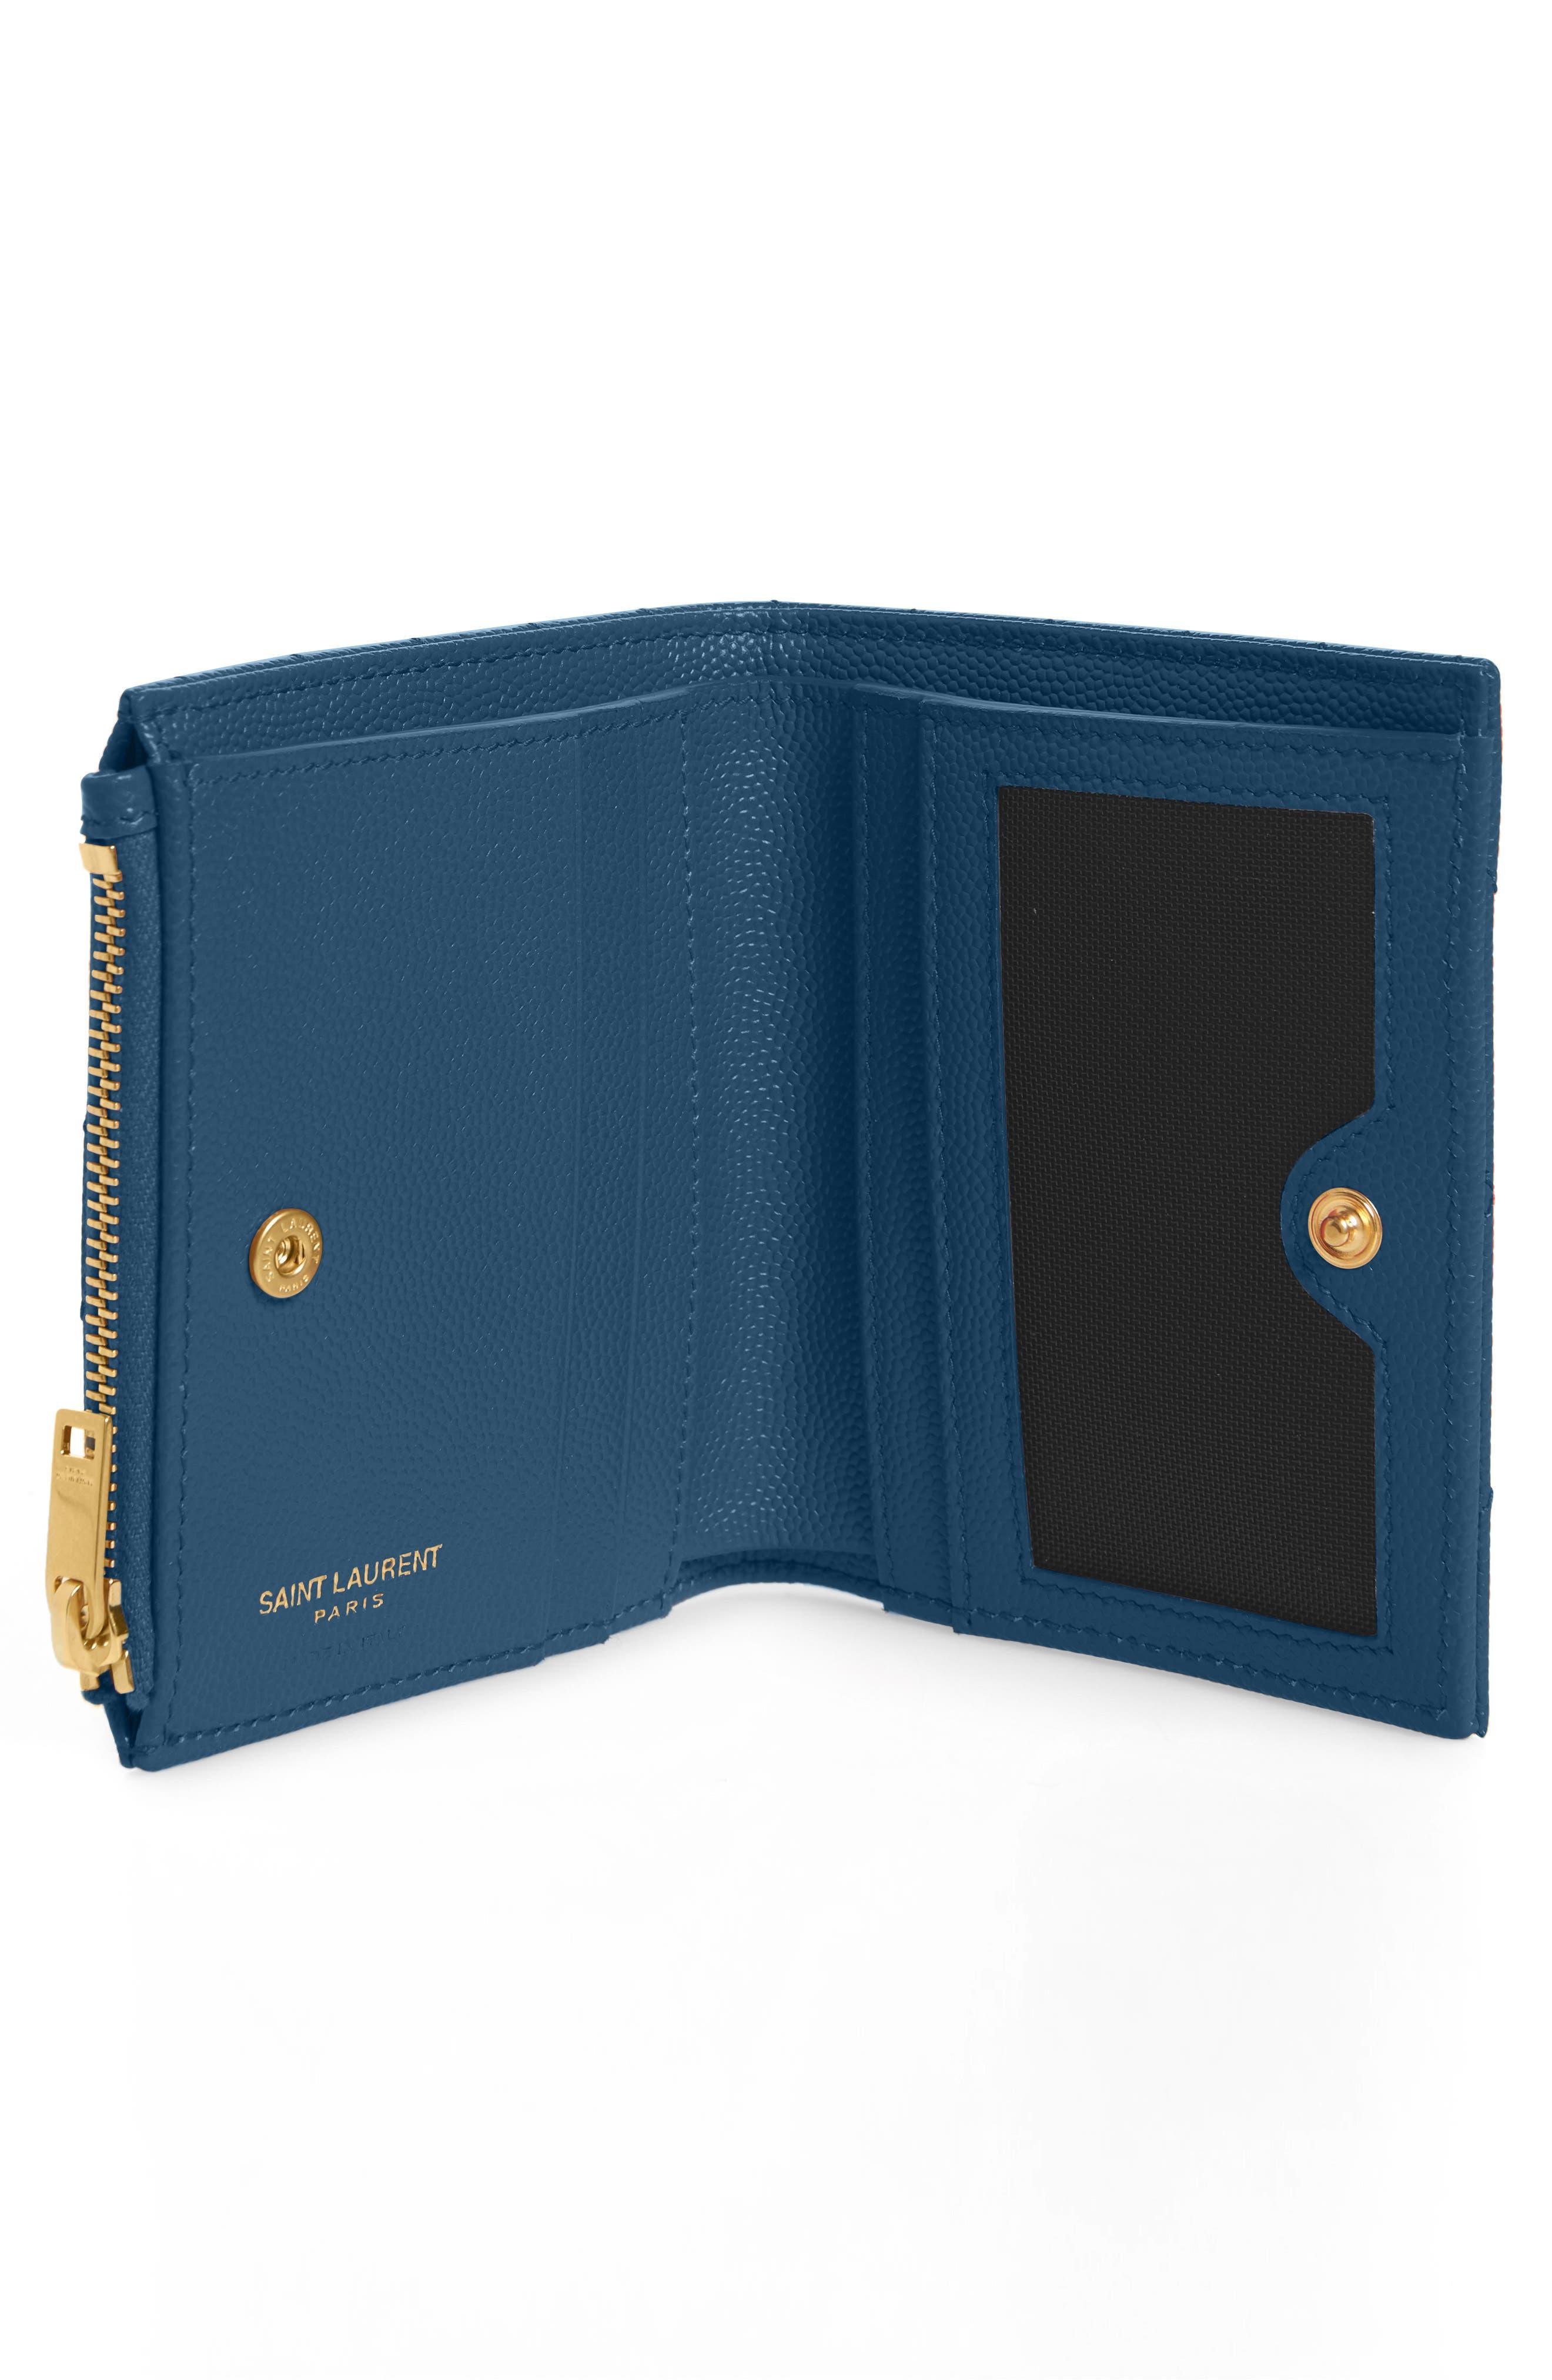 58e2cff506f ysl card case | Nordstrom